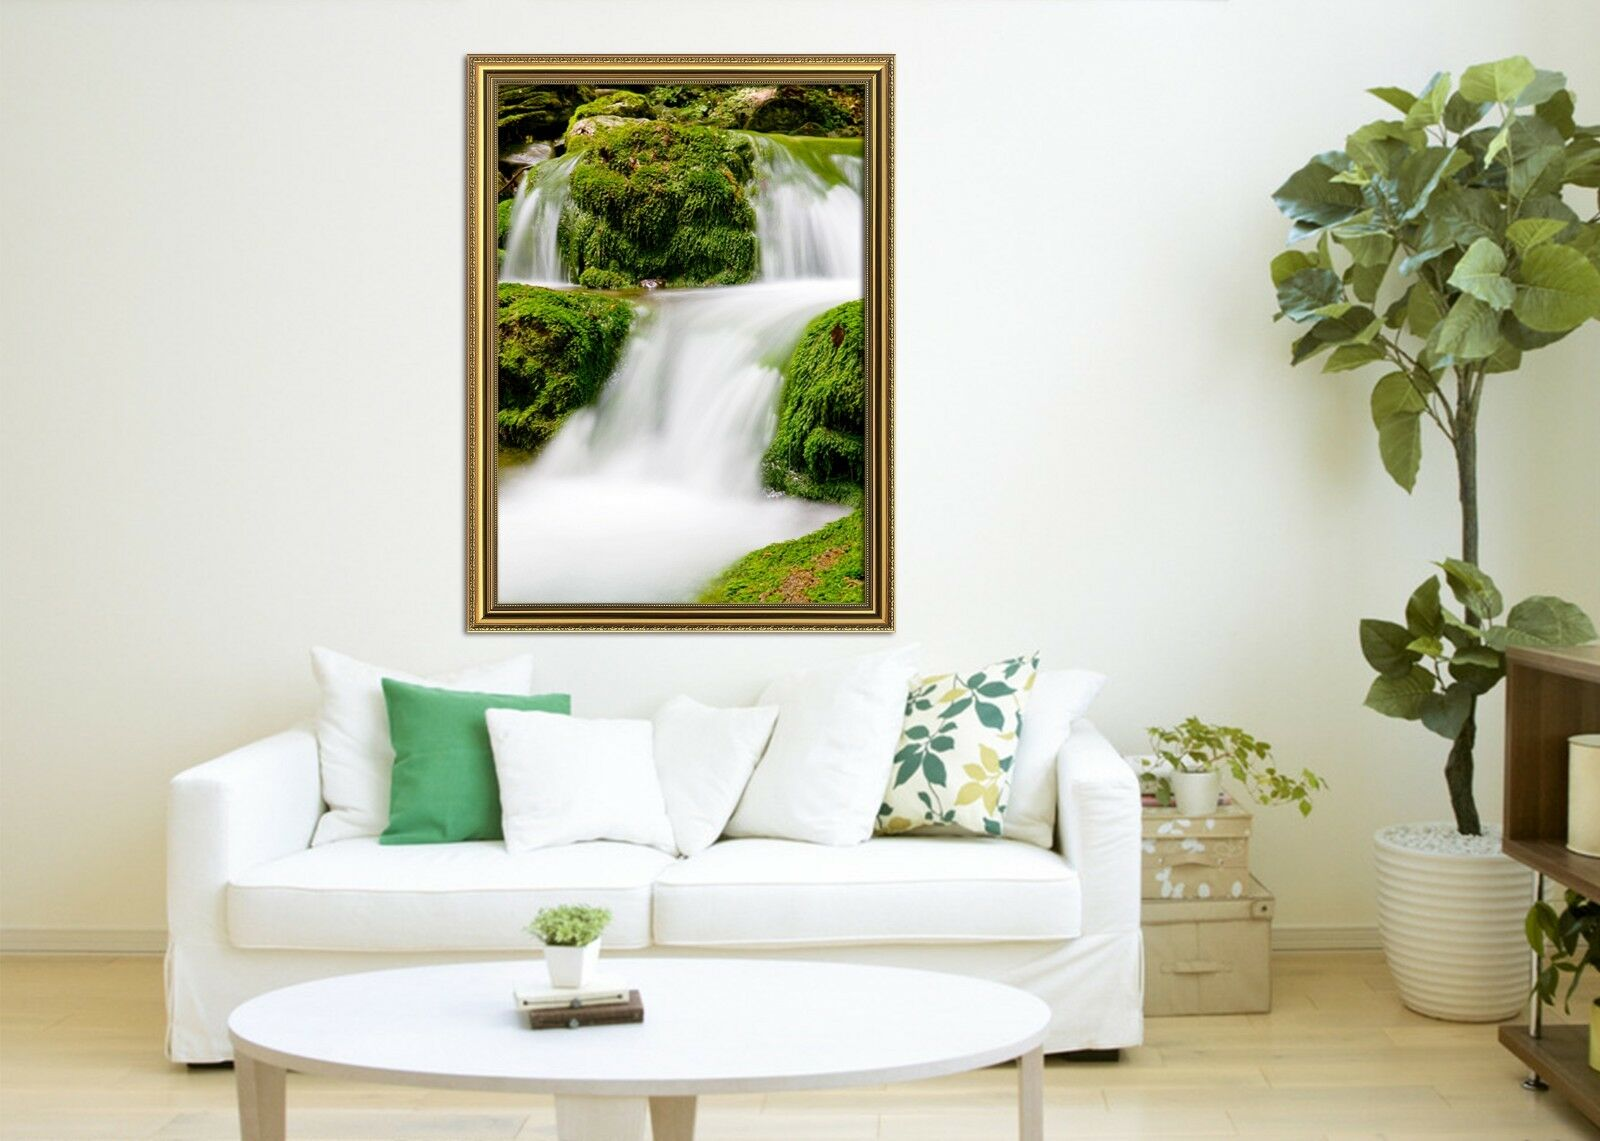 3D White Streams Plant 22 Framed Poster Home Decor Print Painting Art WALLPAPER